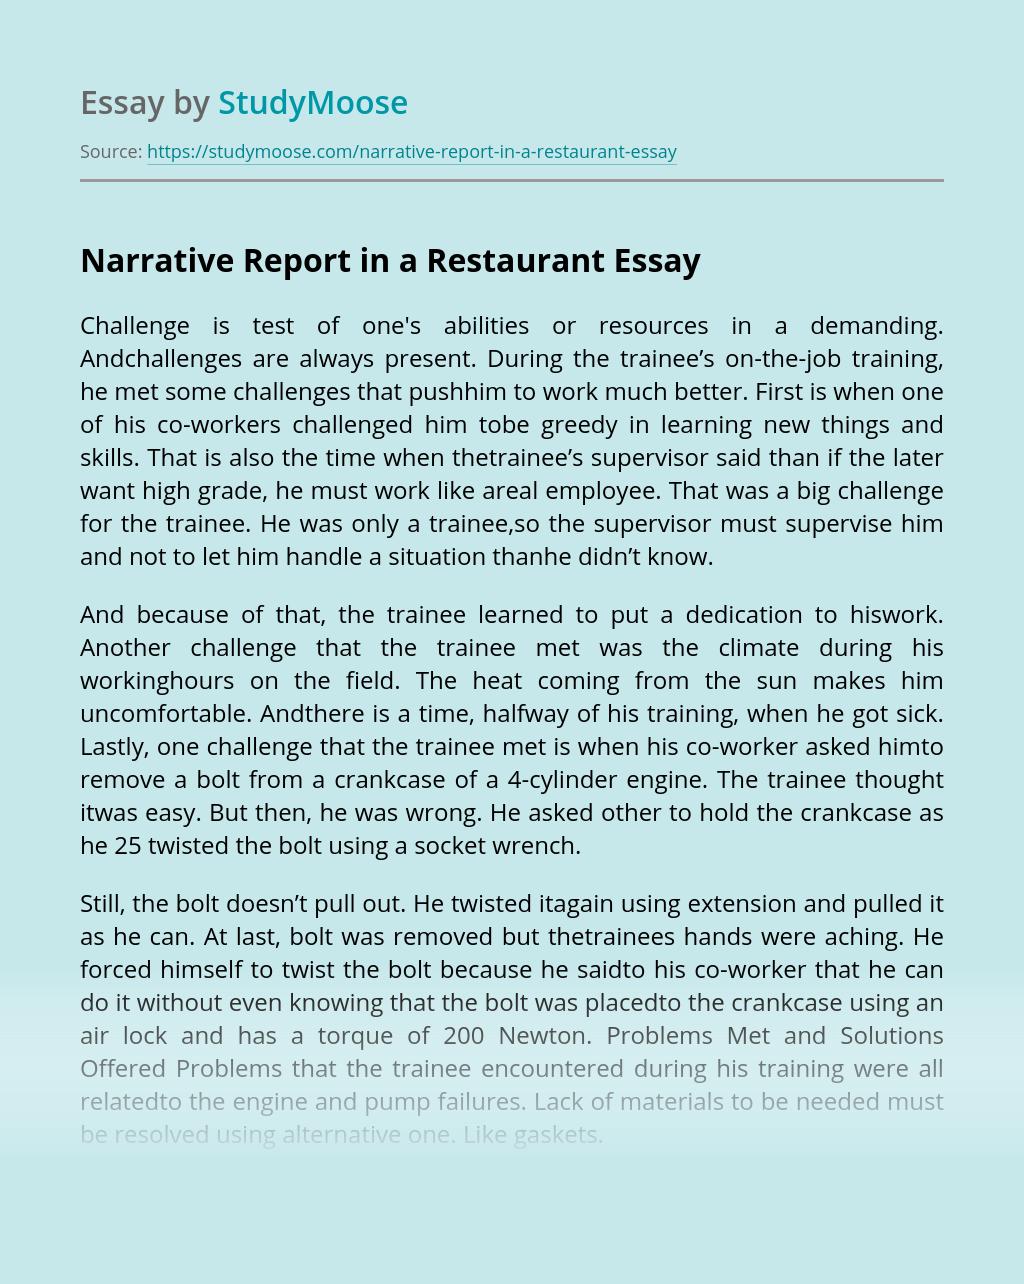 Narrative Report in a Restaurant